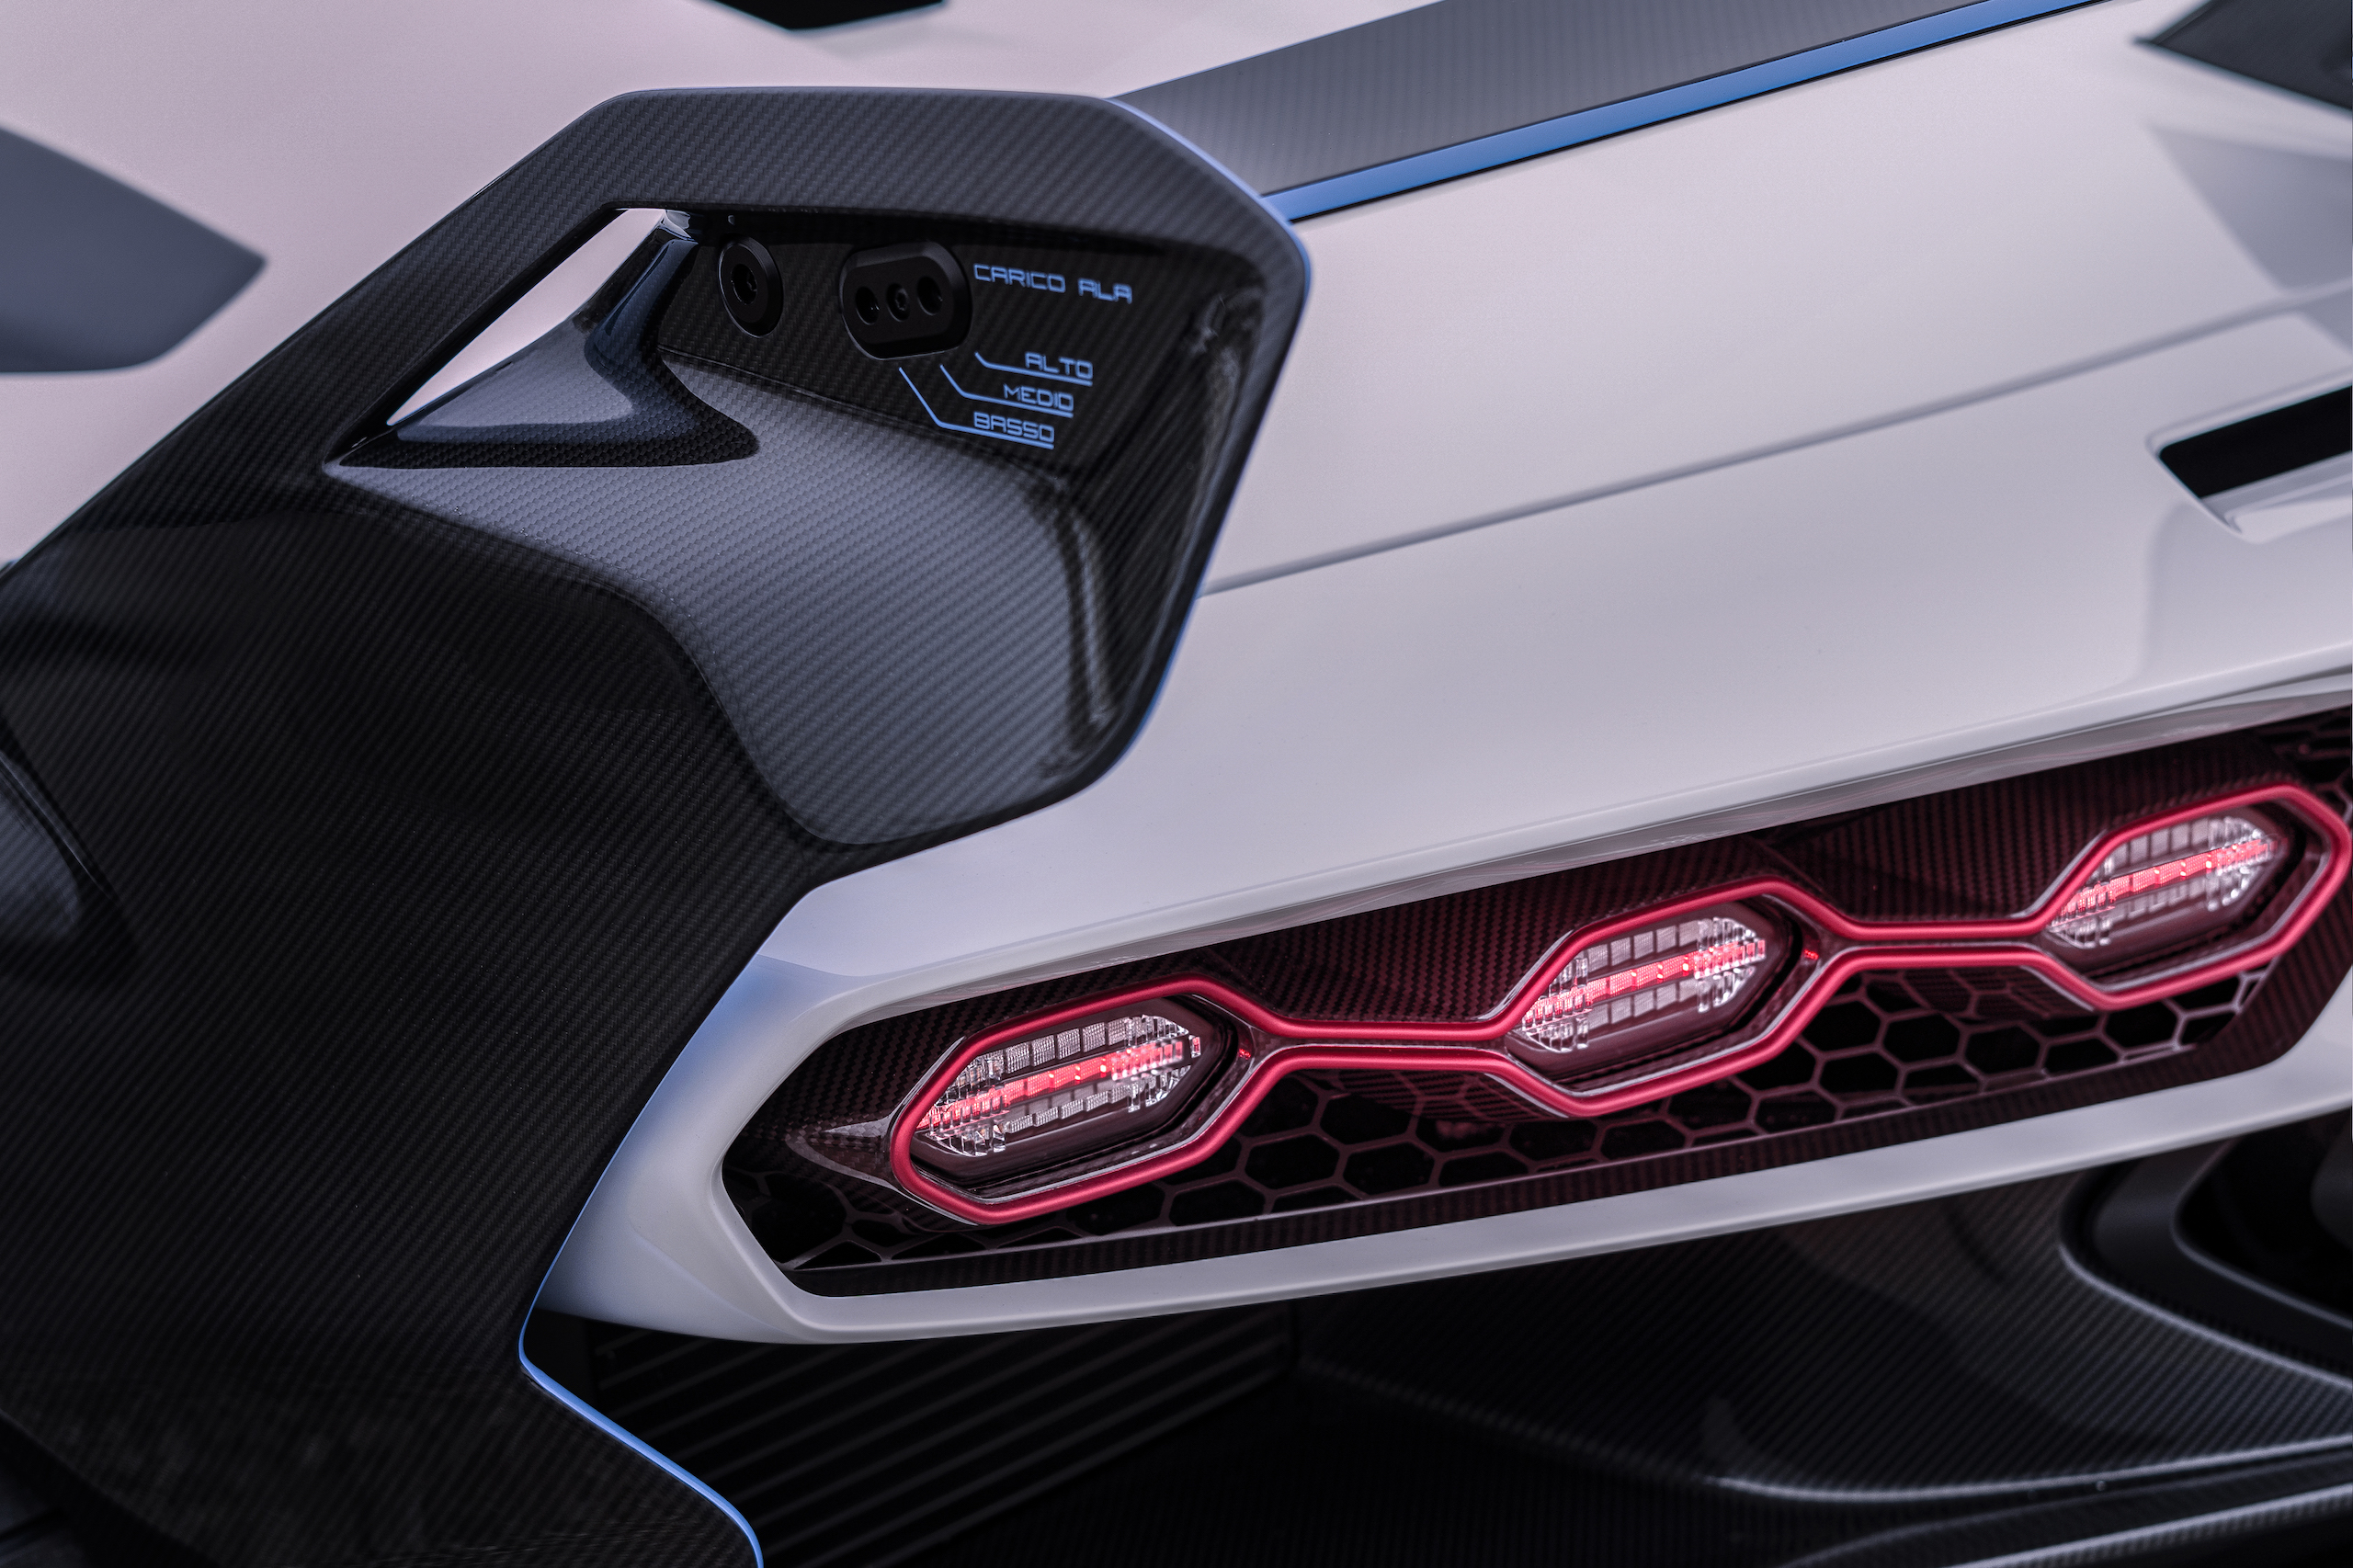 Lamborghini SC20 rear wing detail